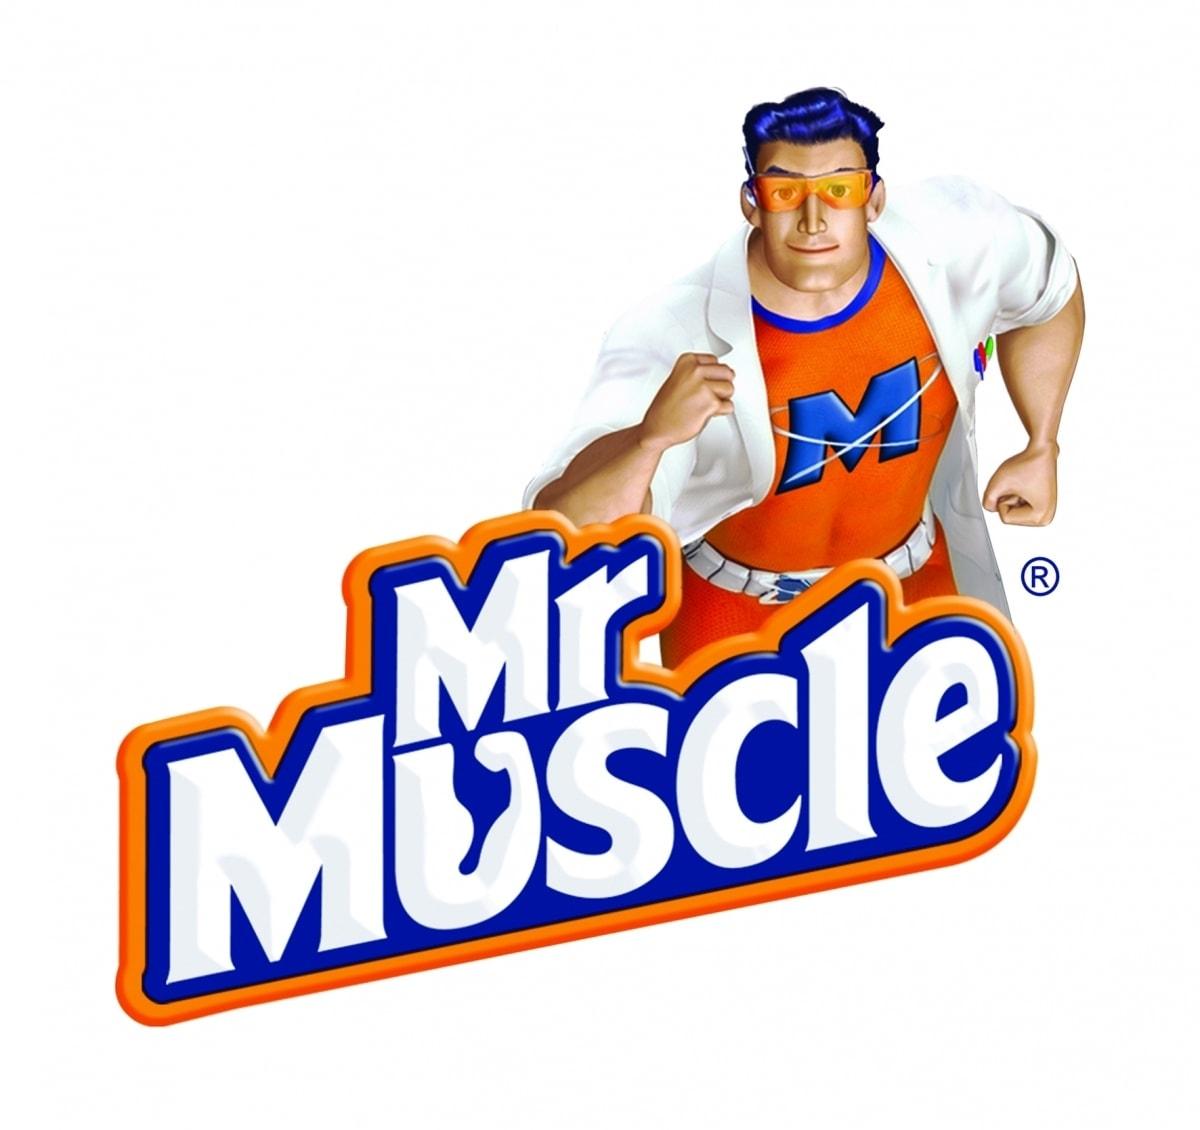 Marketing Mix Of Mr. Muscle